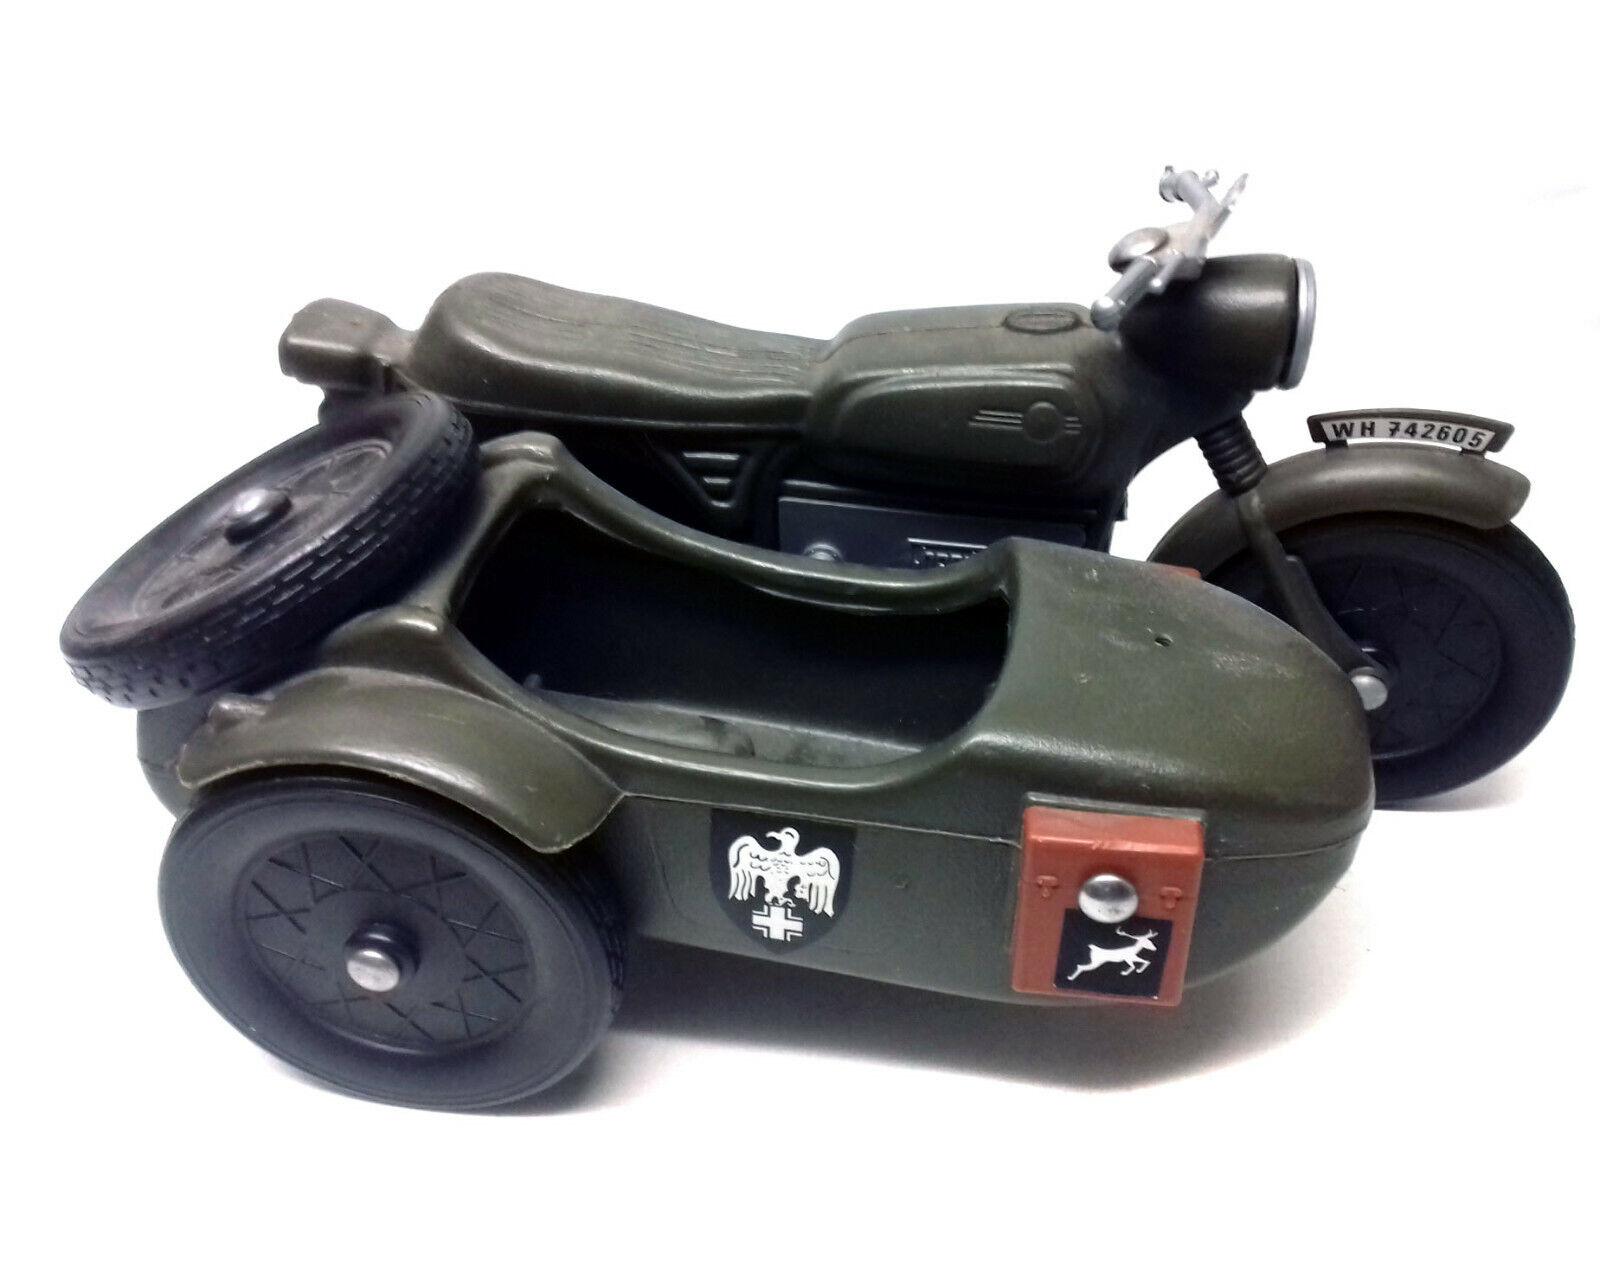 Original Vintage 70's GI JOE ACTION MAN MOTORBIKE & SIDECAR toy  for 12  figures